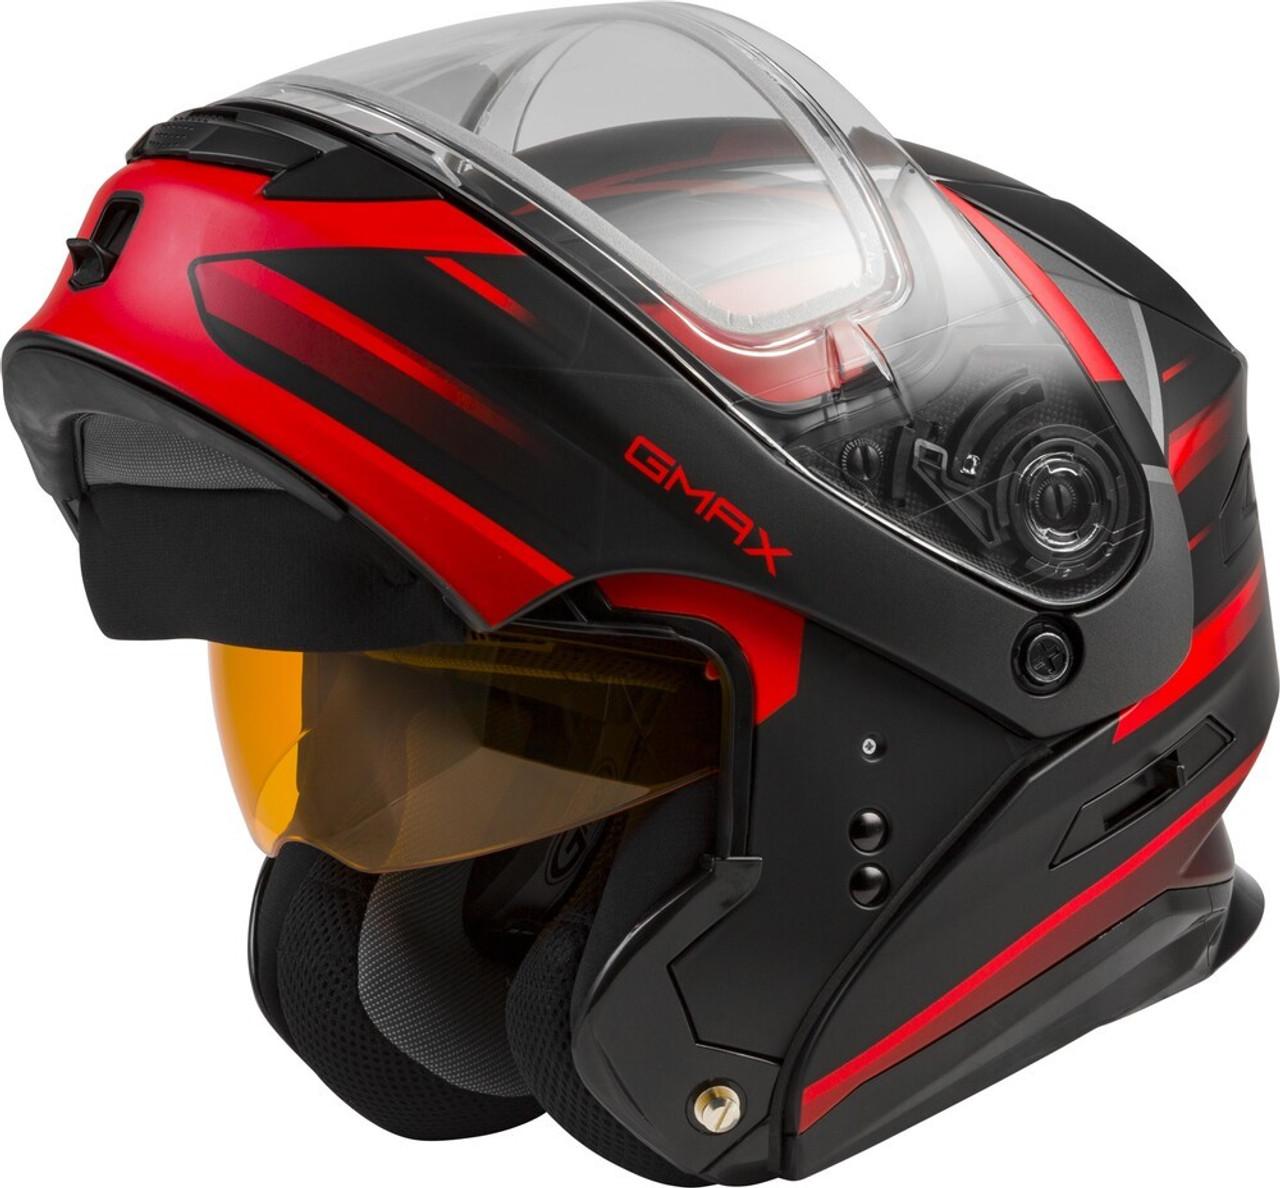 GMAX MD-01S Modular Snow Helmet Descendant Matte Black/Red